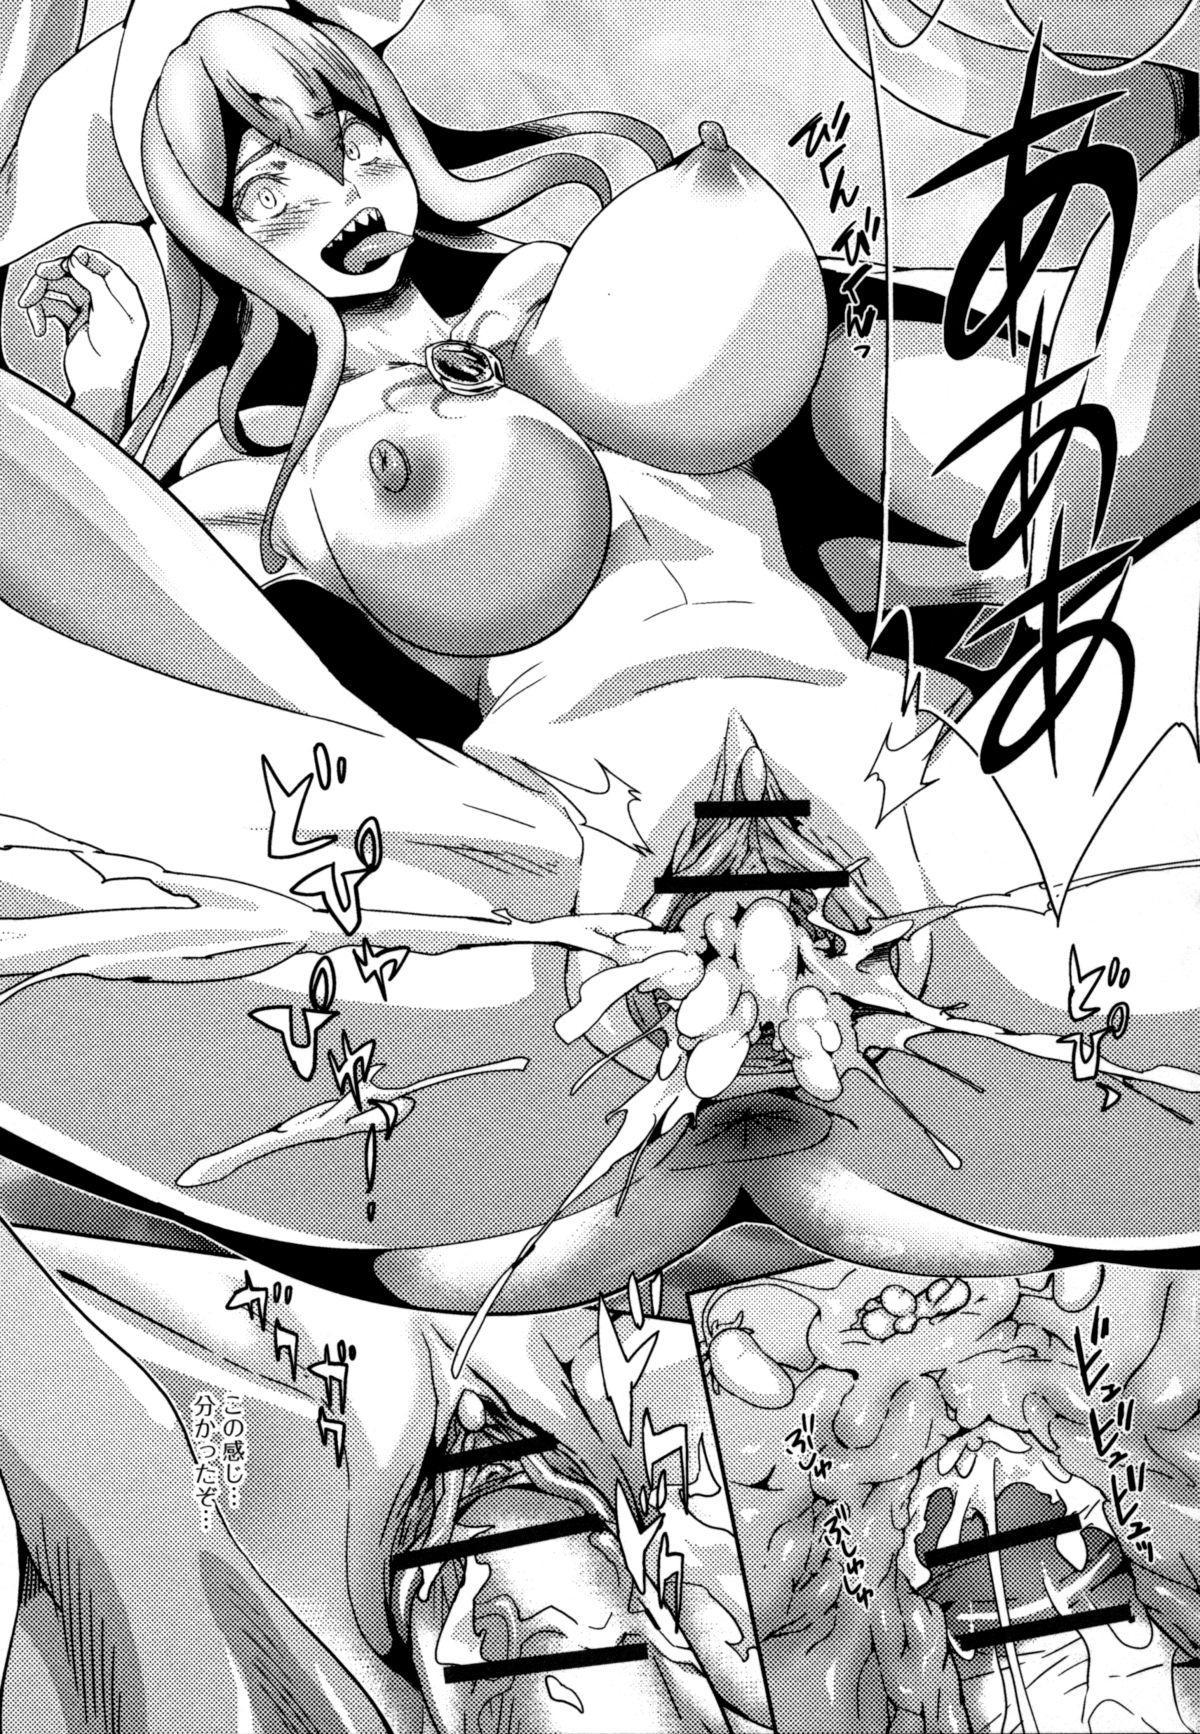 Monster Musume to no Kougou 80